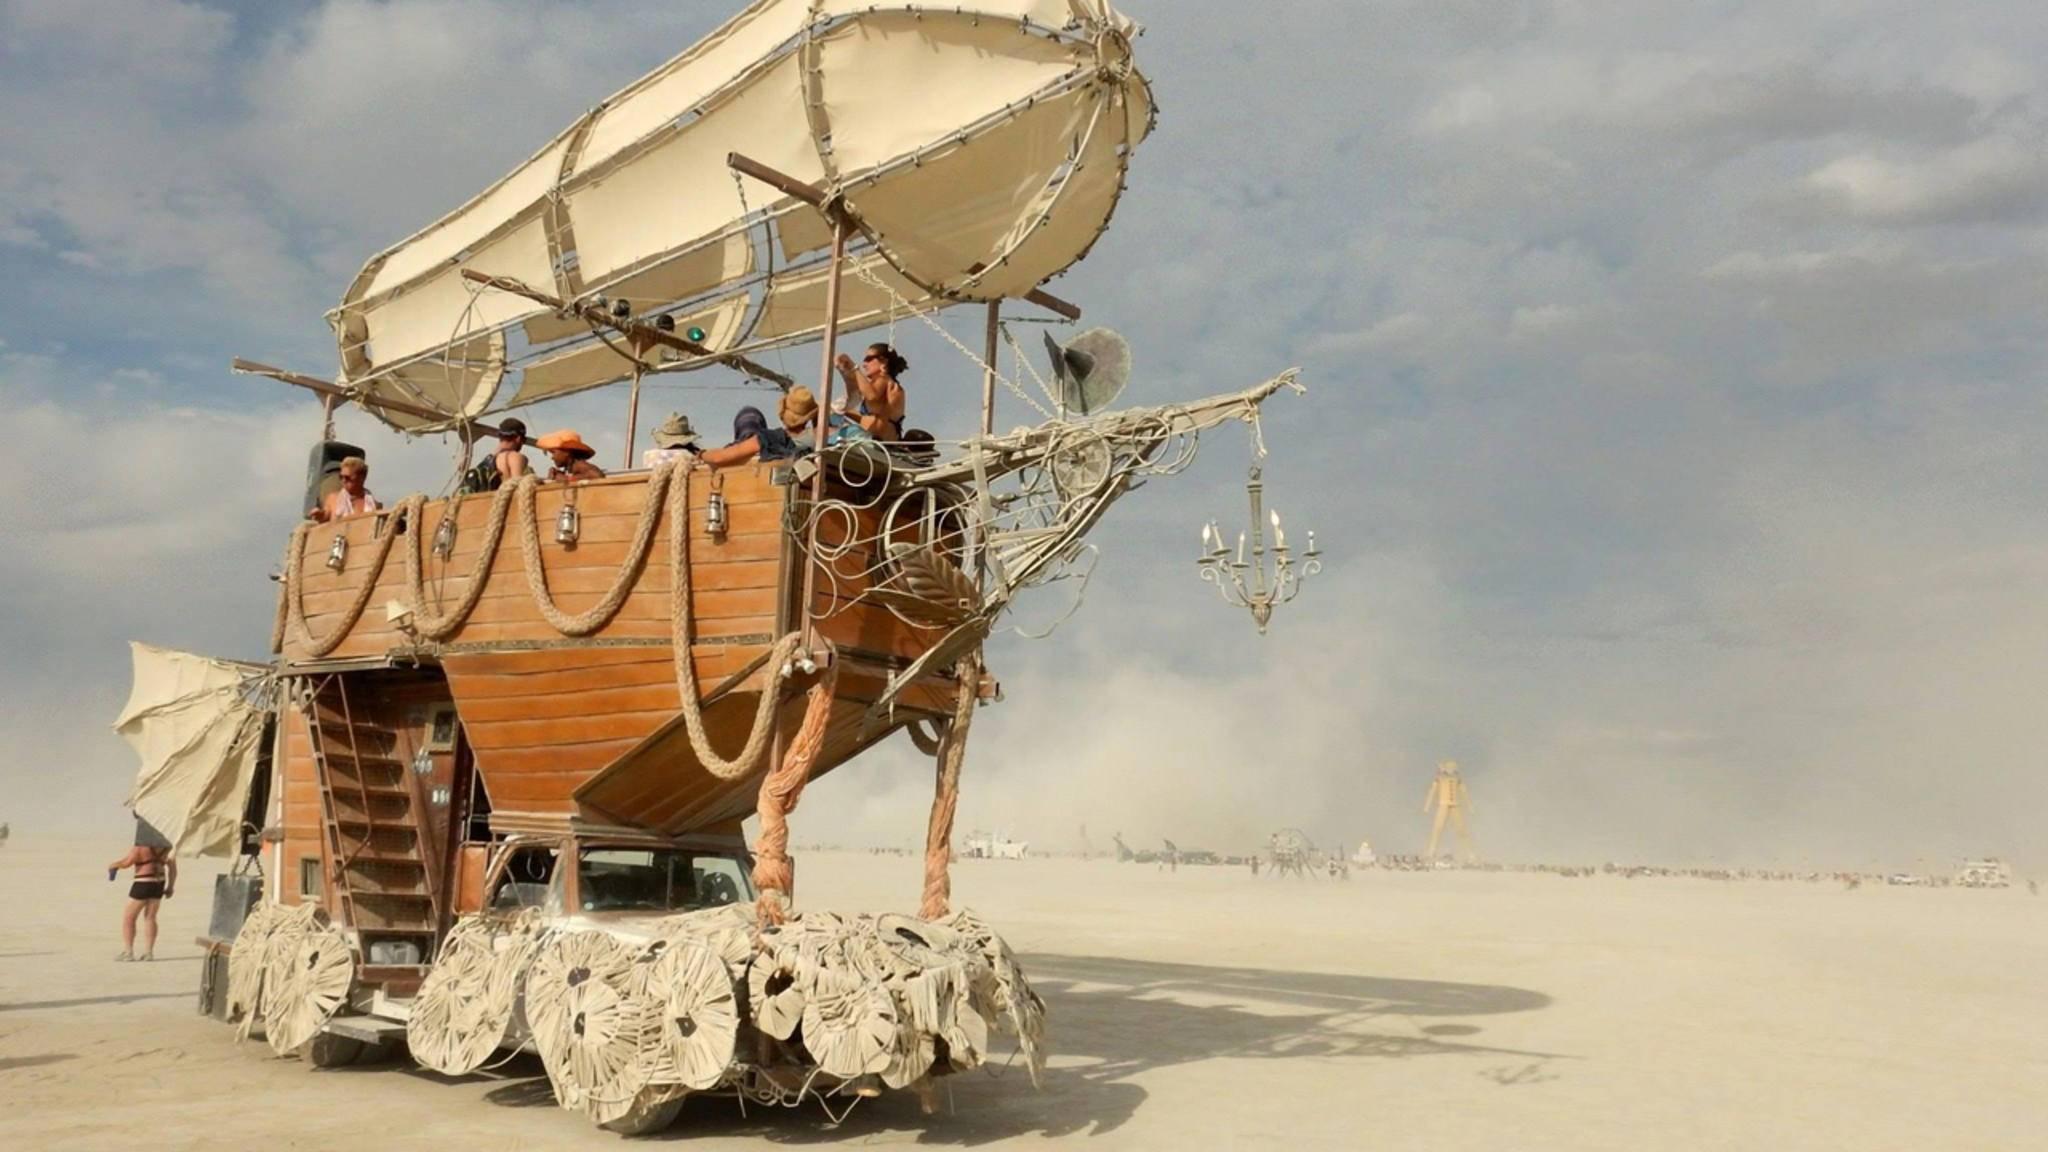 Mutant Vehicle Burning Man CC Wikimedia Anne Gomez 2015